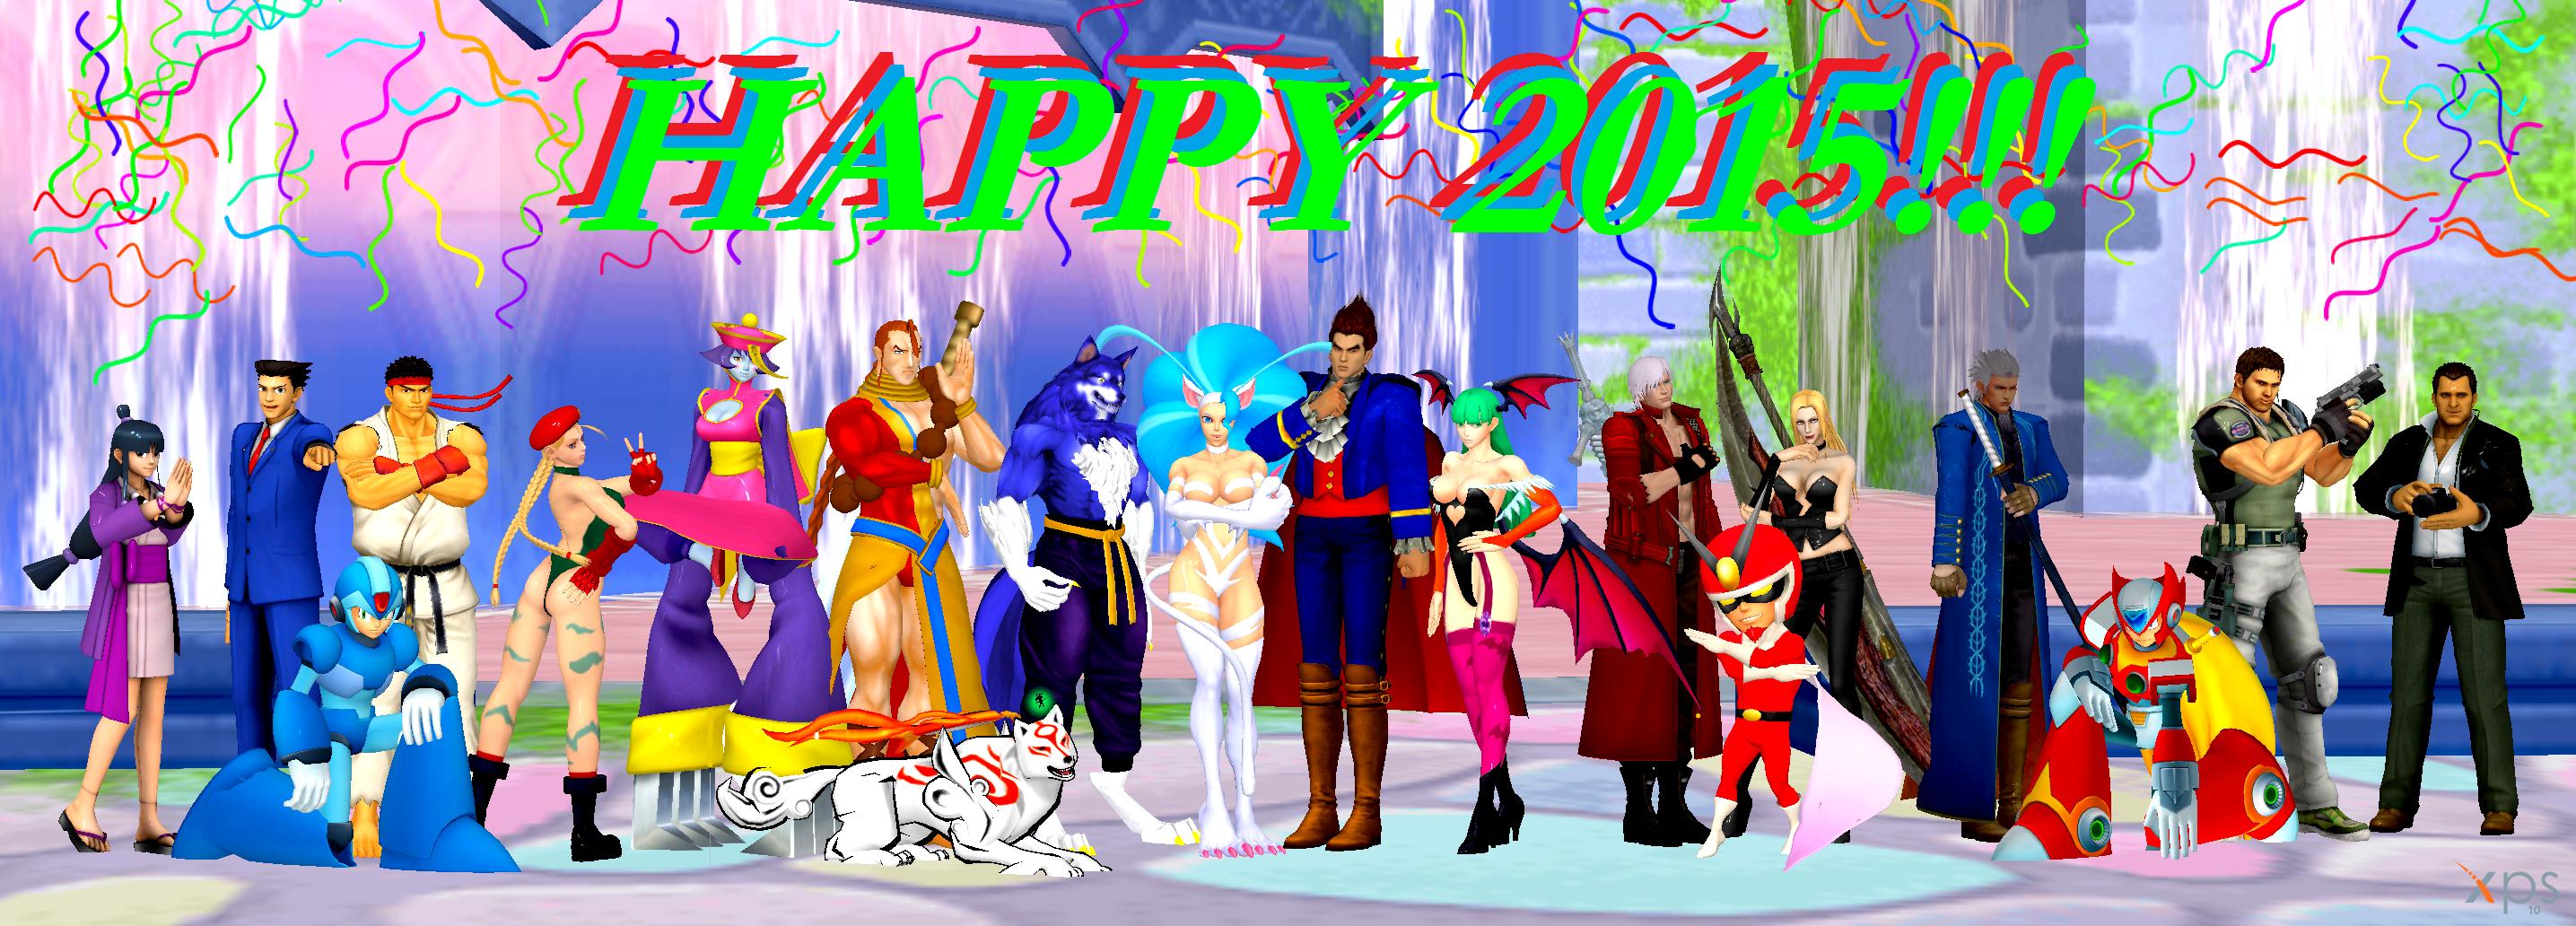 Happy 2015! by NekoHybrid